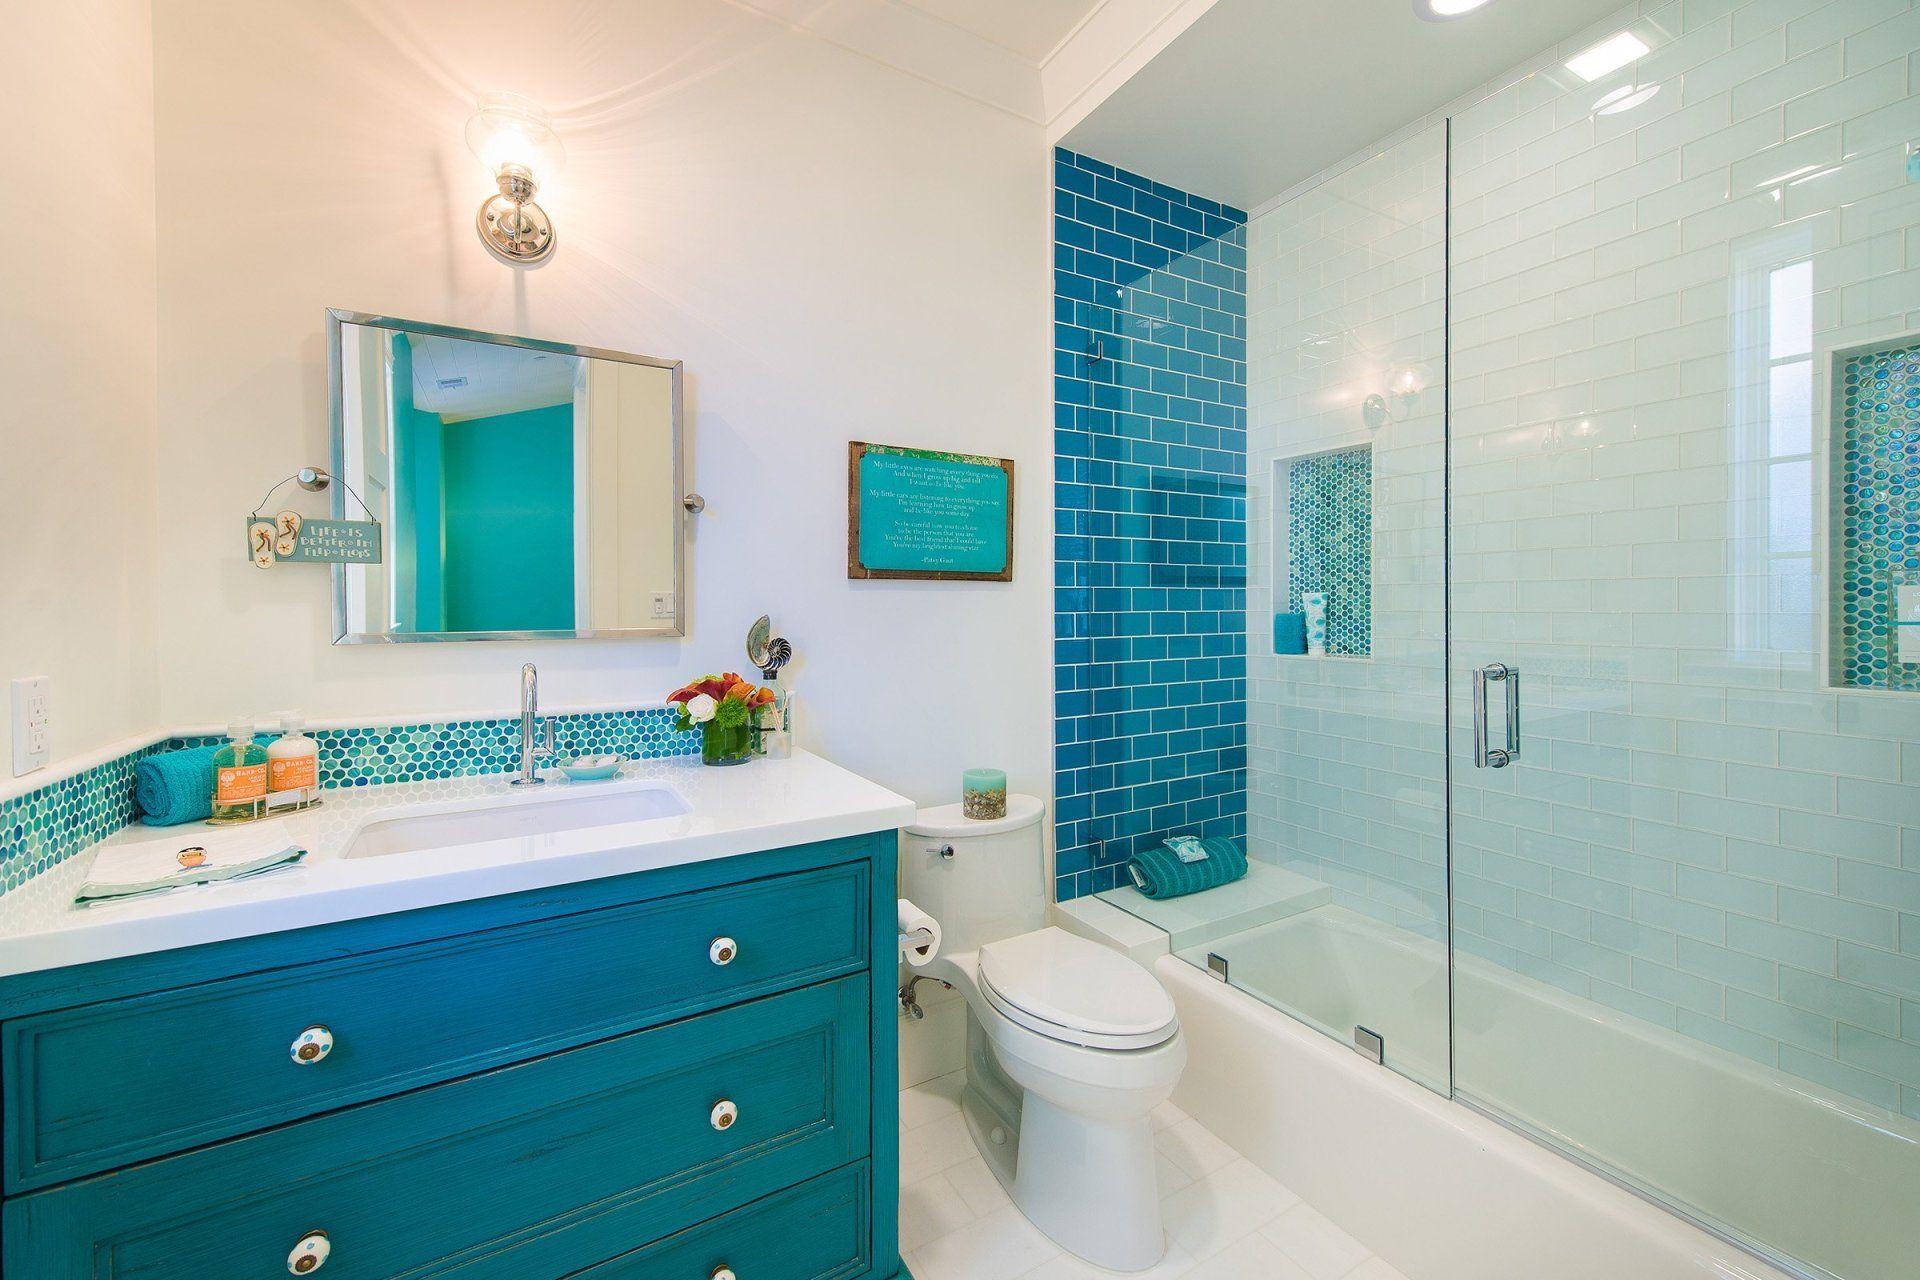 Blue Coastal Dream Ideas For A Unique Beach Design Beach Houses In 2020 Beach House Bathroom Bathrooms Remodel Dream Beach Houses